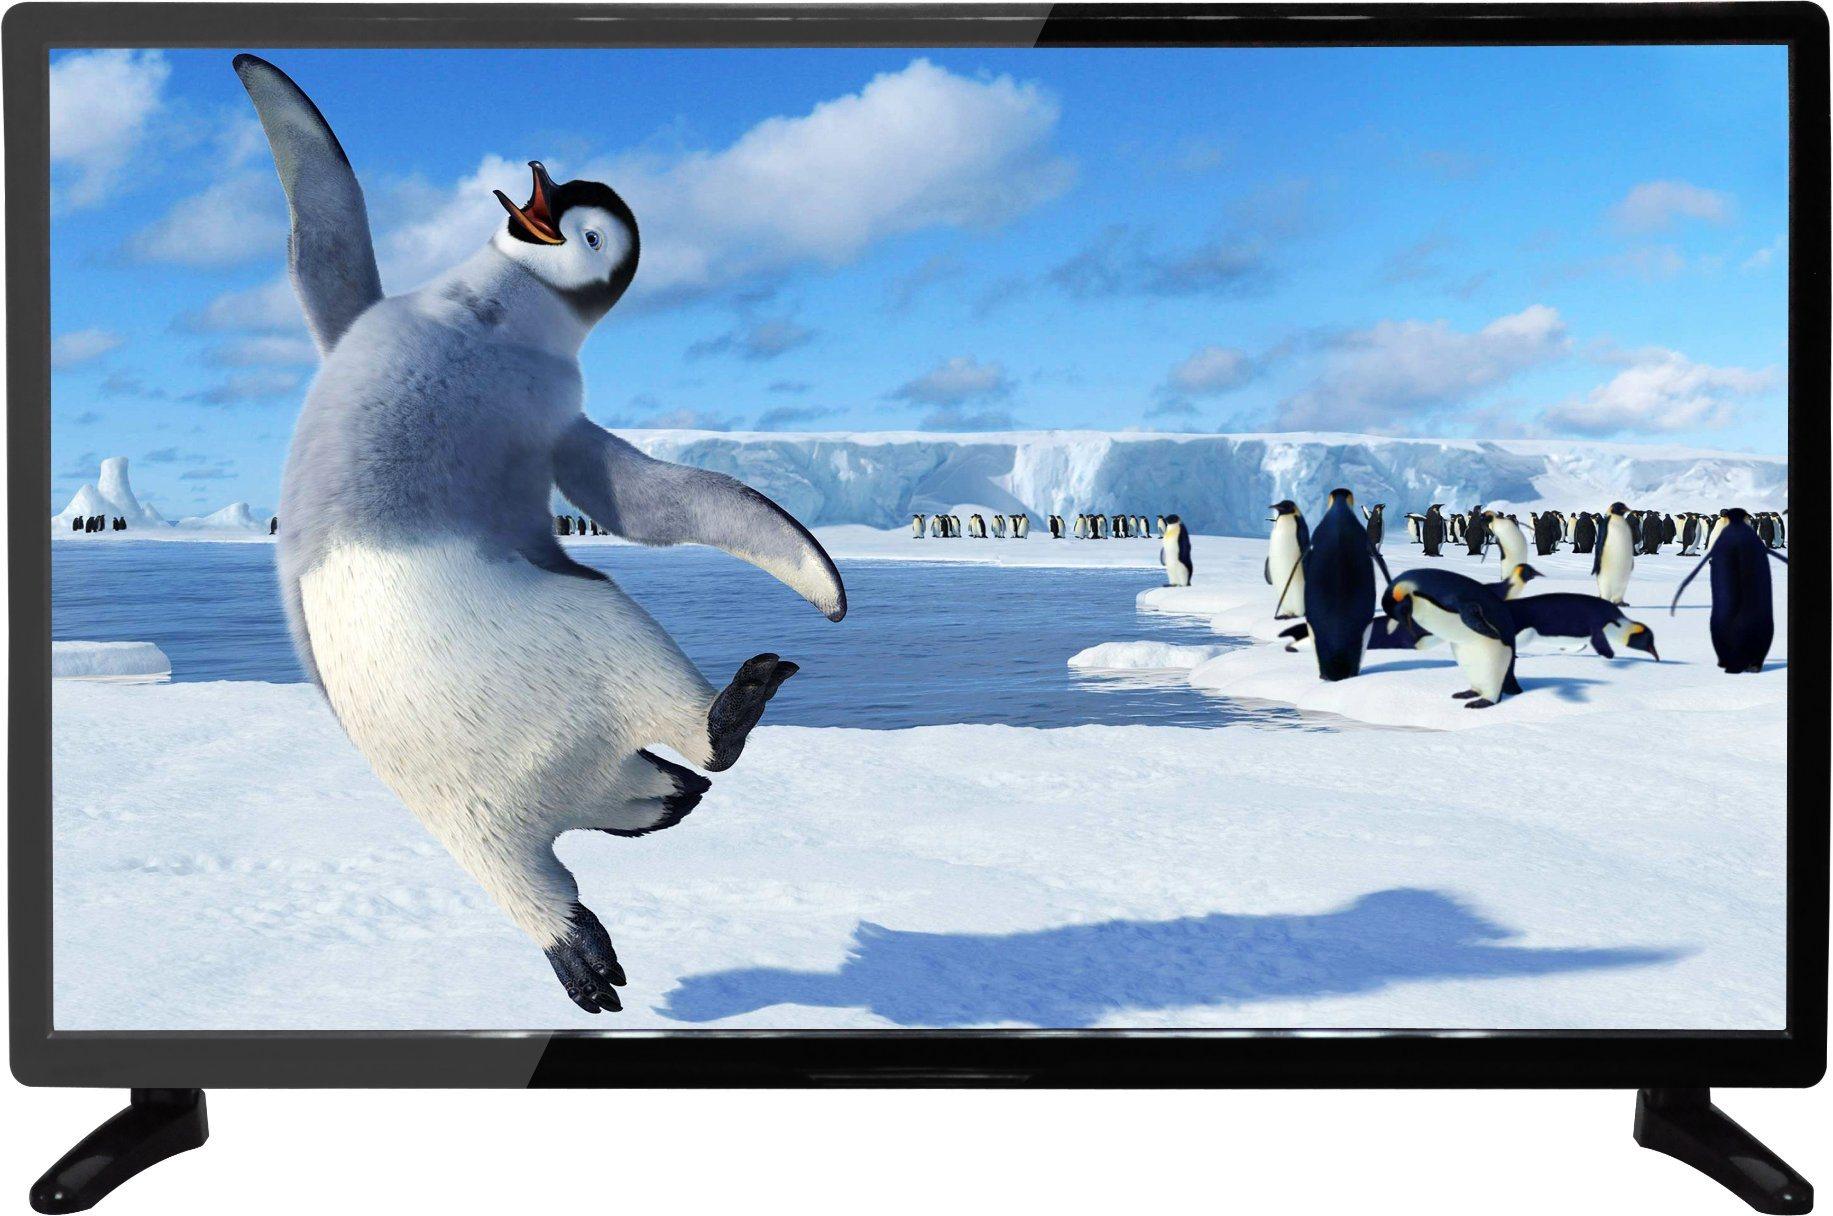 Slim 24 Inch Deld New Model LED TV with DVB-T2/S2/T